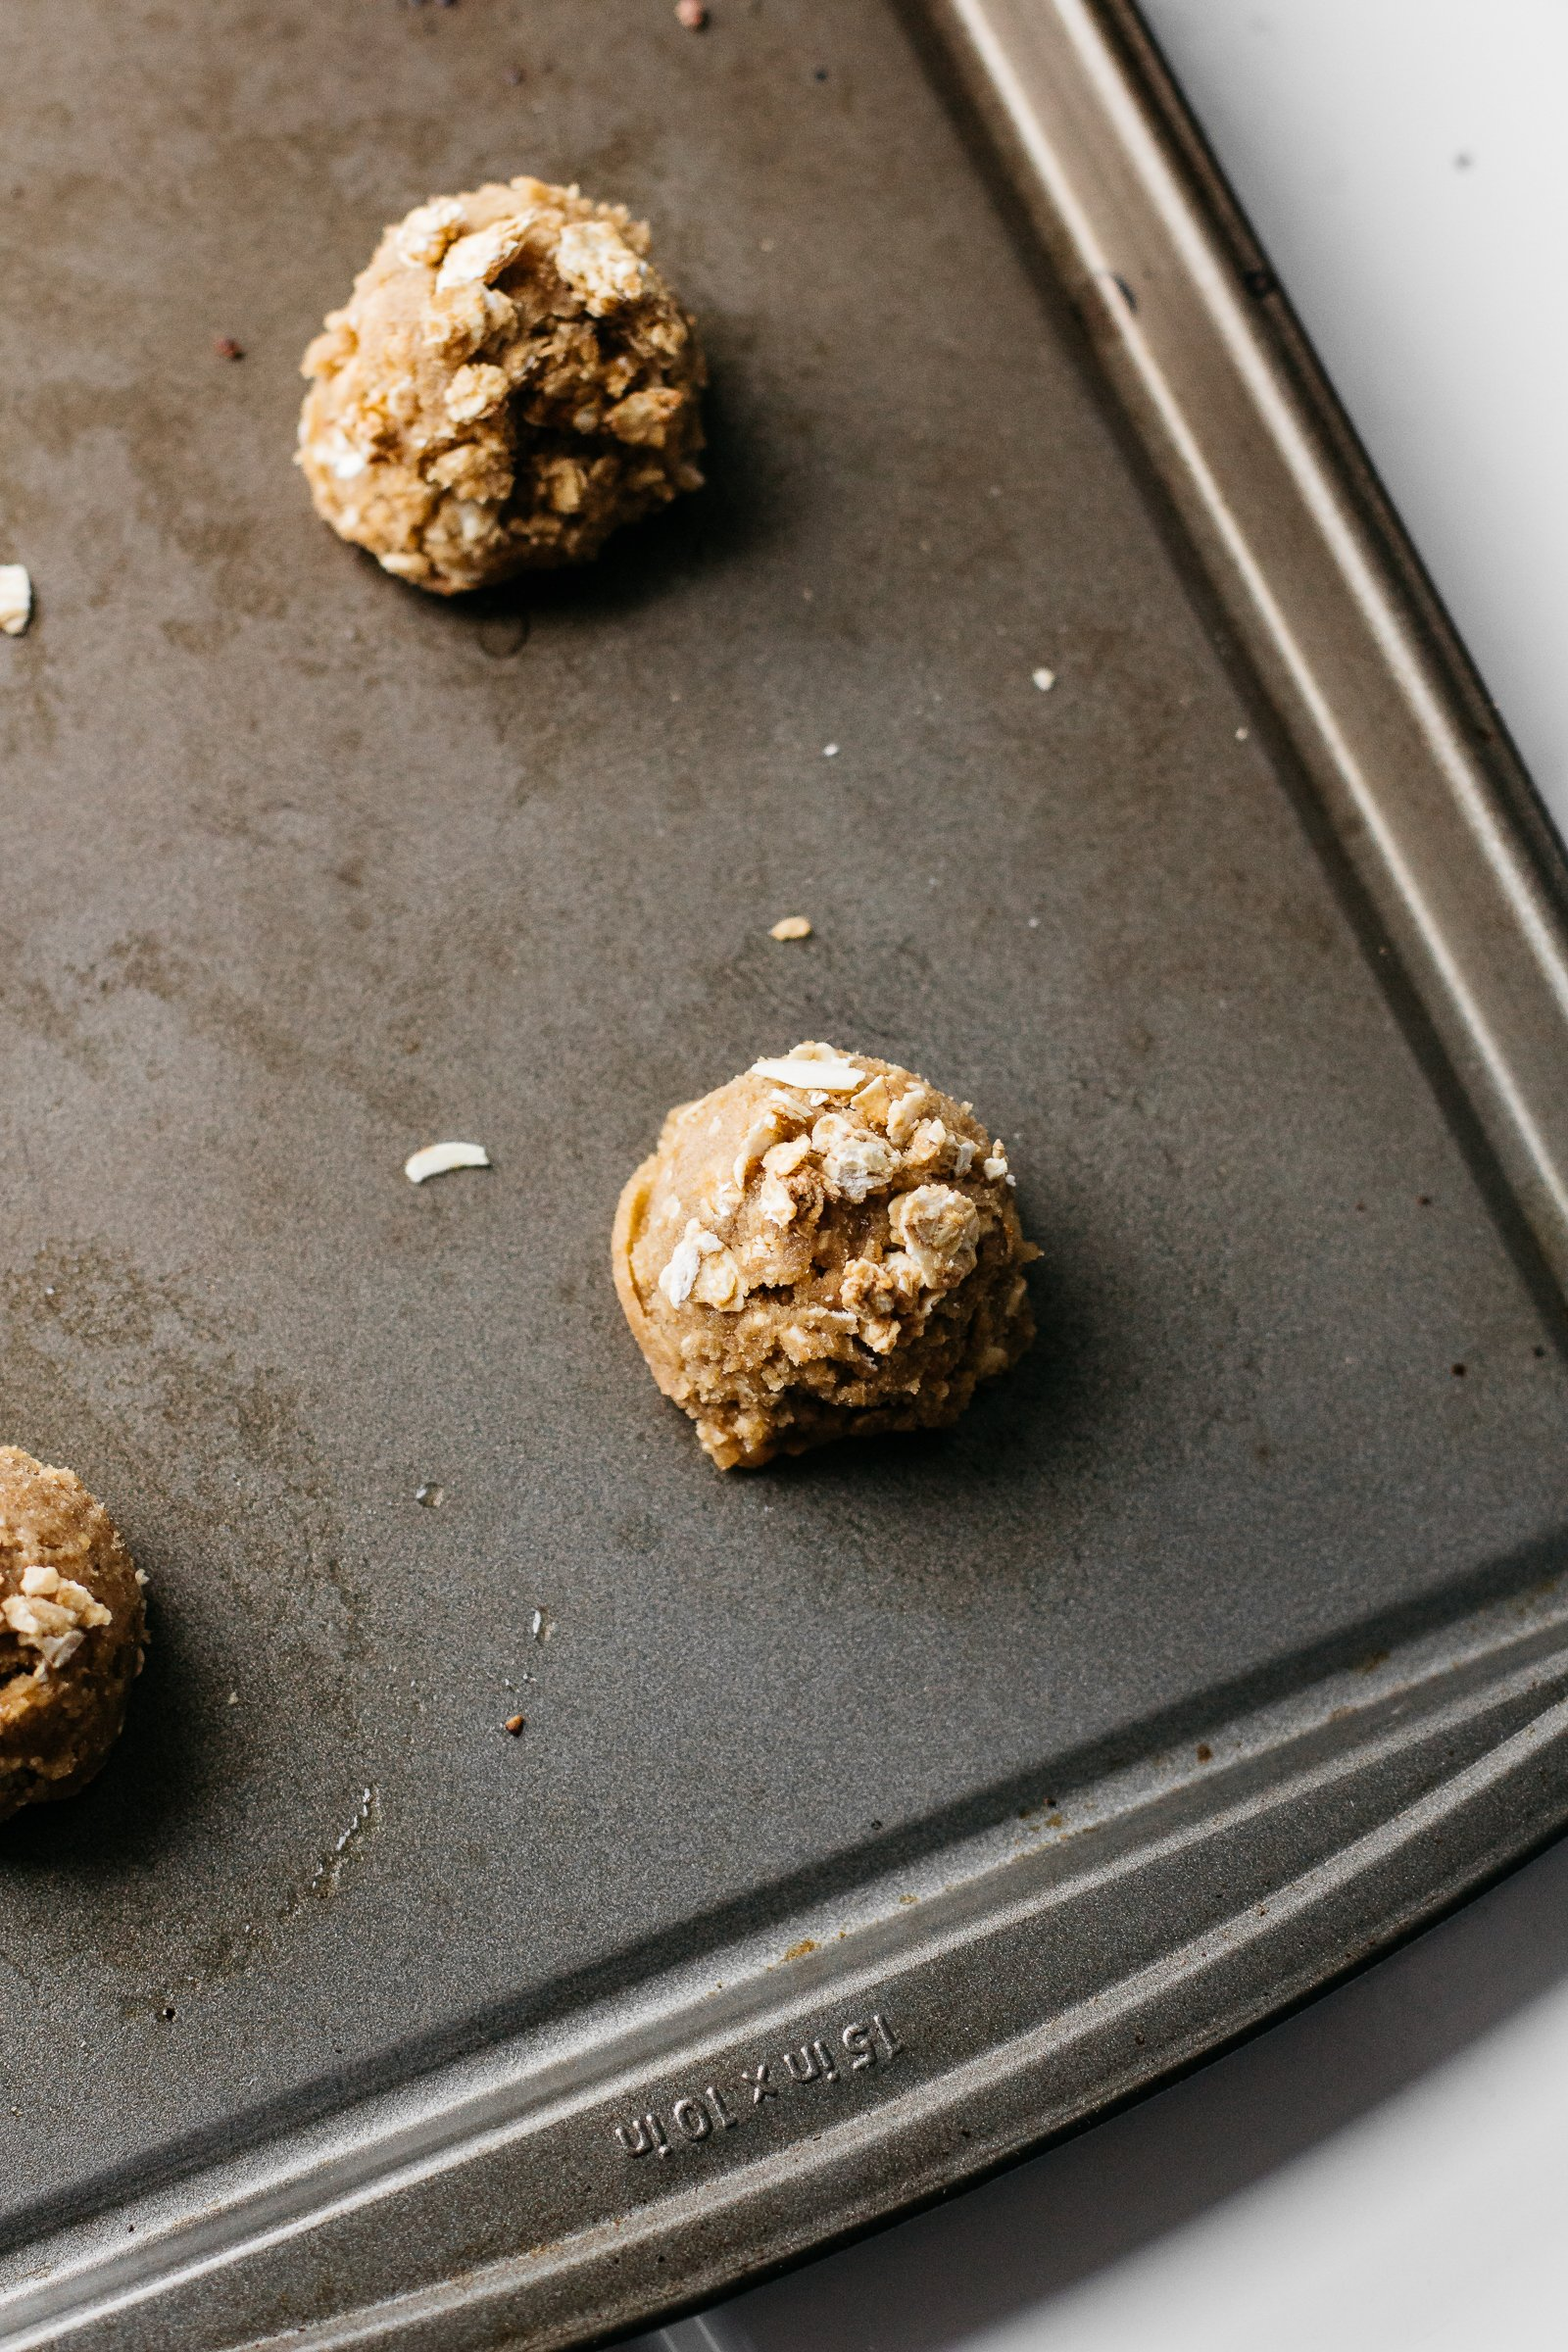 quaker simply granola, quaker oatmeal cookies, oatmeal cookie recipe, southern baking blog, mens baking blog